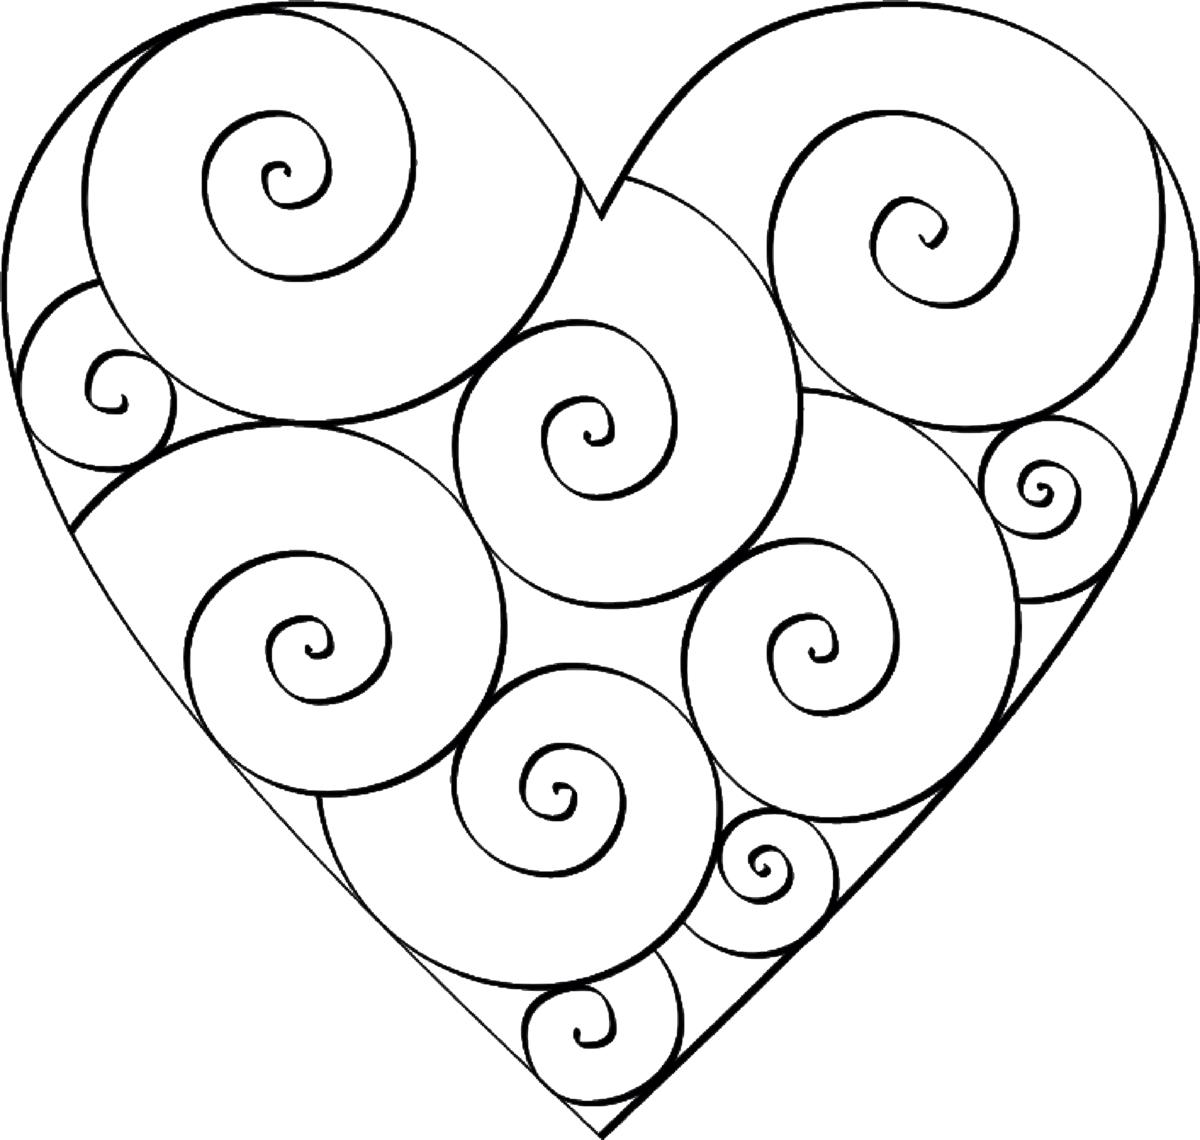 лучница рисовать картинки сердечки с узорами акции